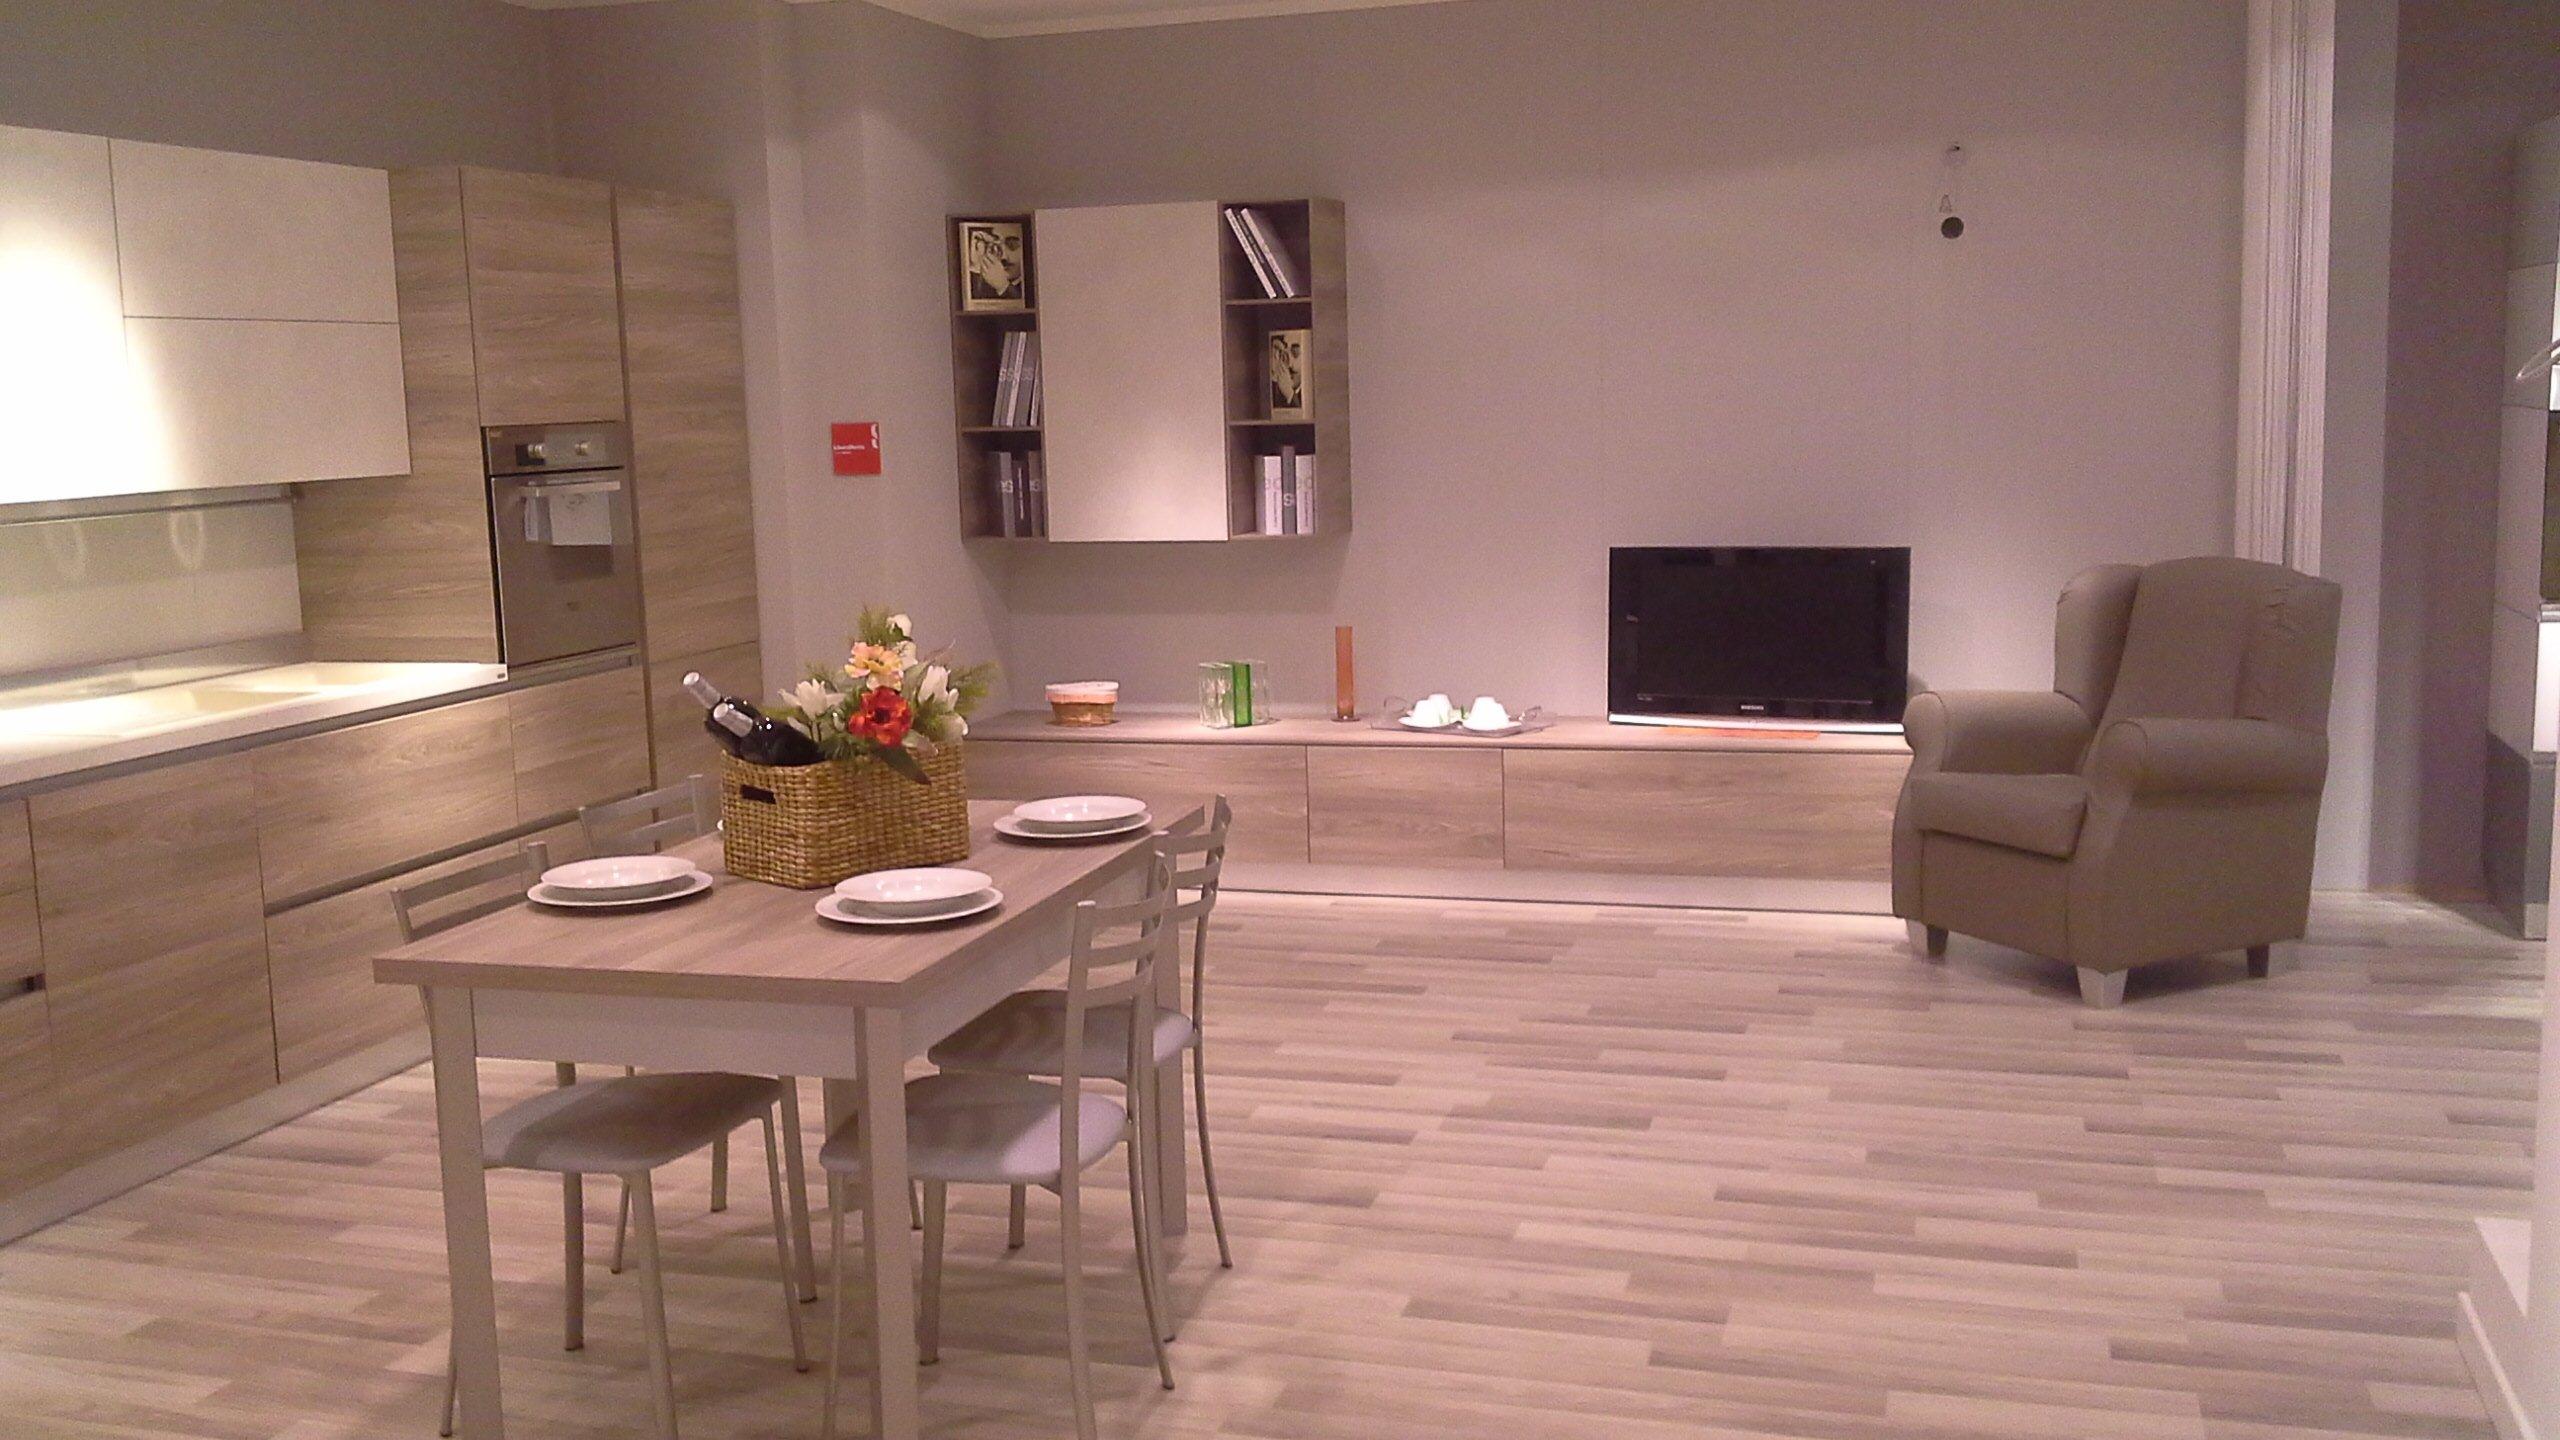 cucina con tavolo al centro